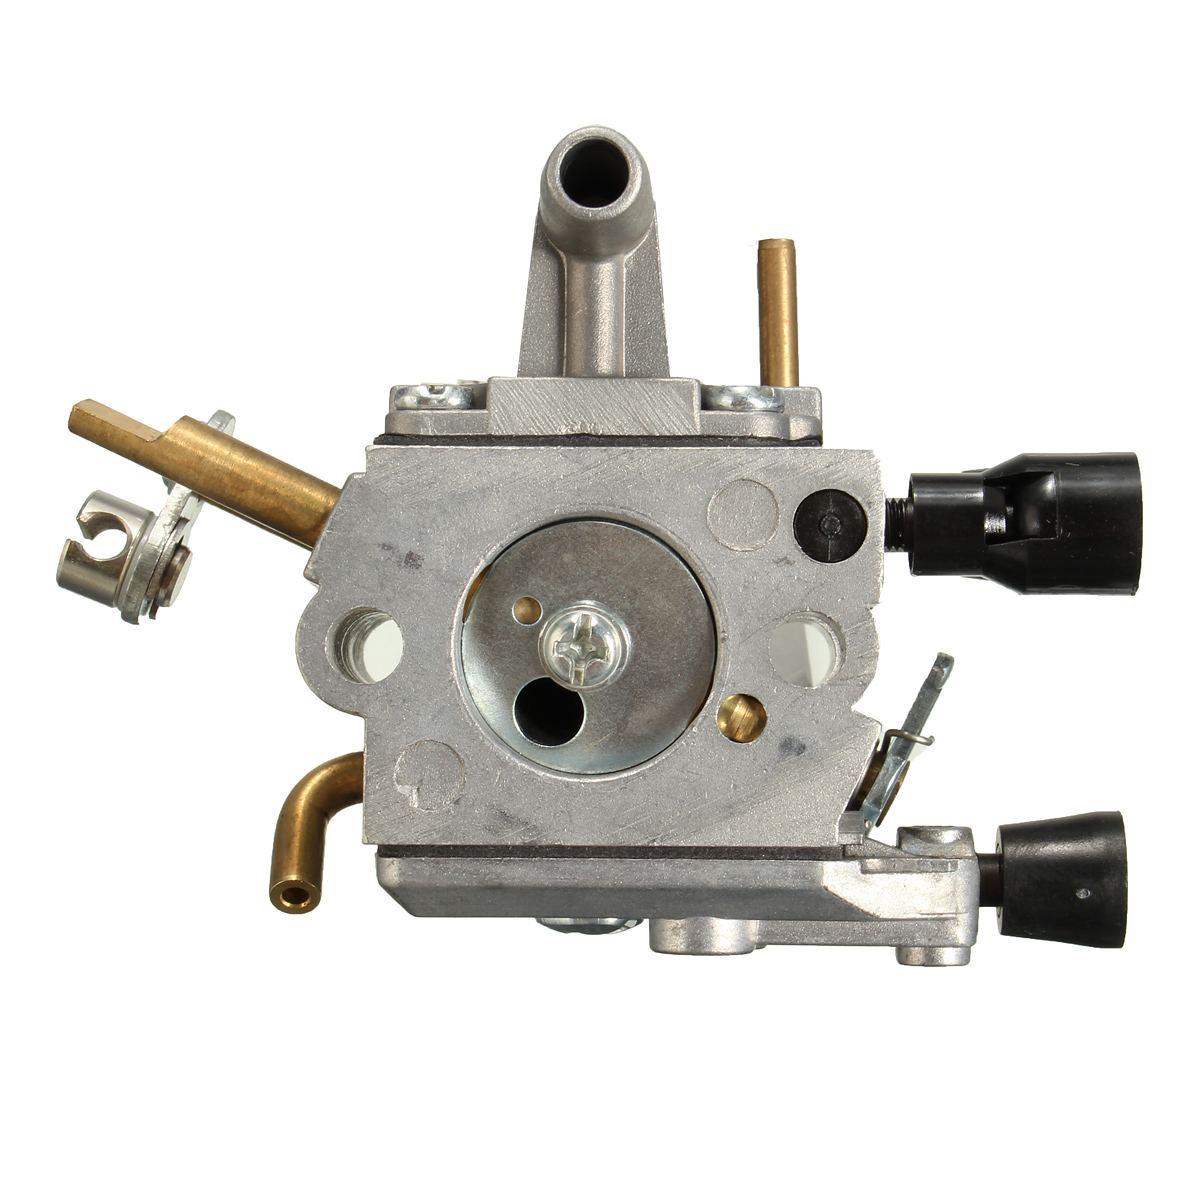 Metal Carburettor Carb Fits For STIHL FS400 FS450 FS480 SP400 450 Zama C1Q-S34H 4128 120 0651Metal Carburettor Carb Fits For STIHL FS400 FS450 FS480 SP400 450 Zama C1Q-S34H 4128 120 0651